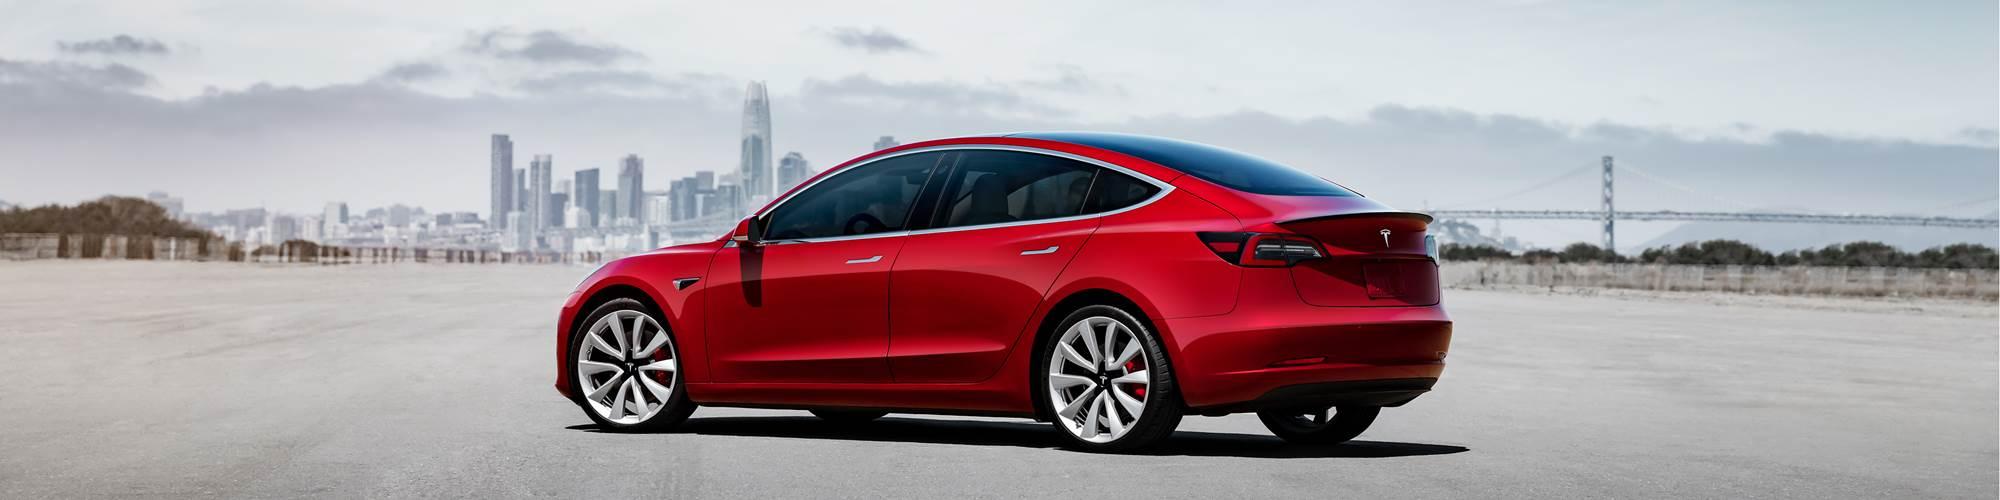 ABG Model 3 Tesla